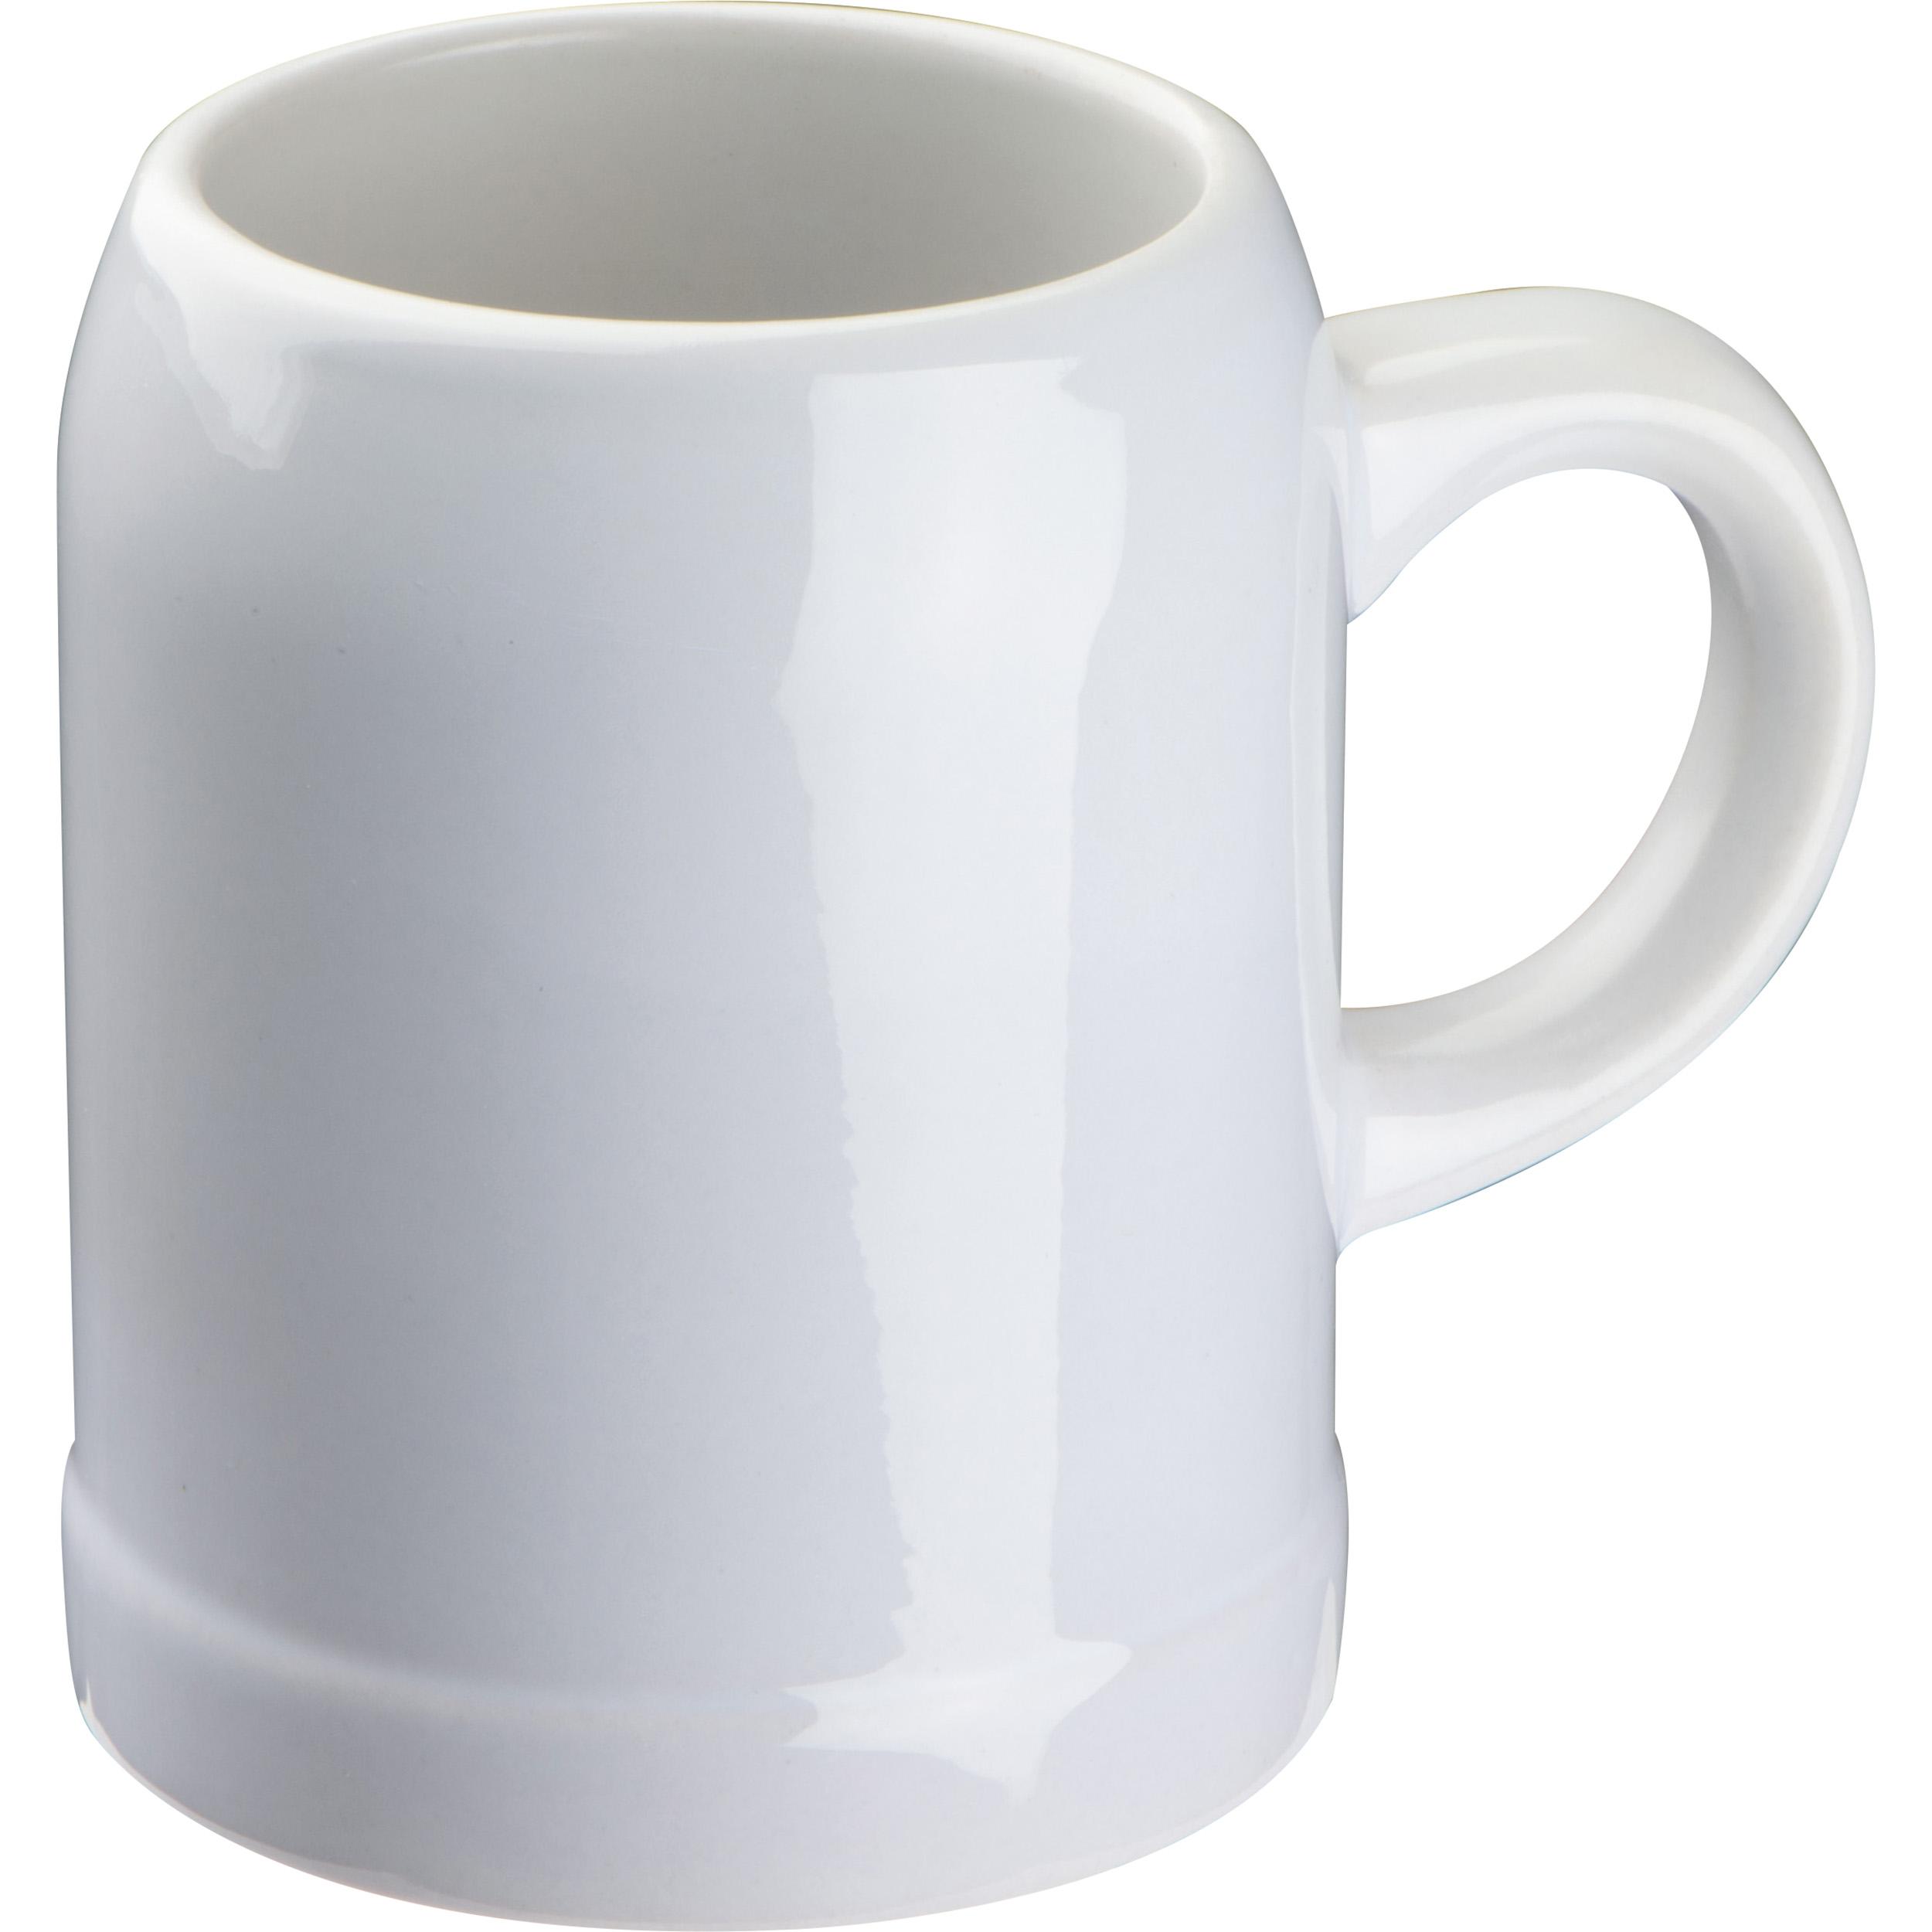 Stone jug 200 ml